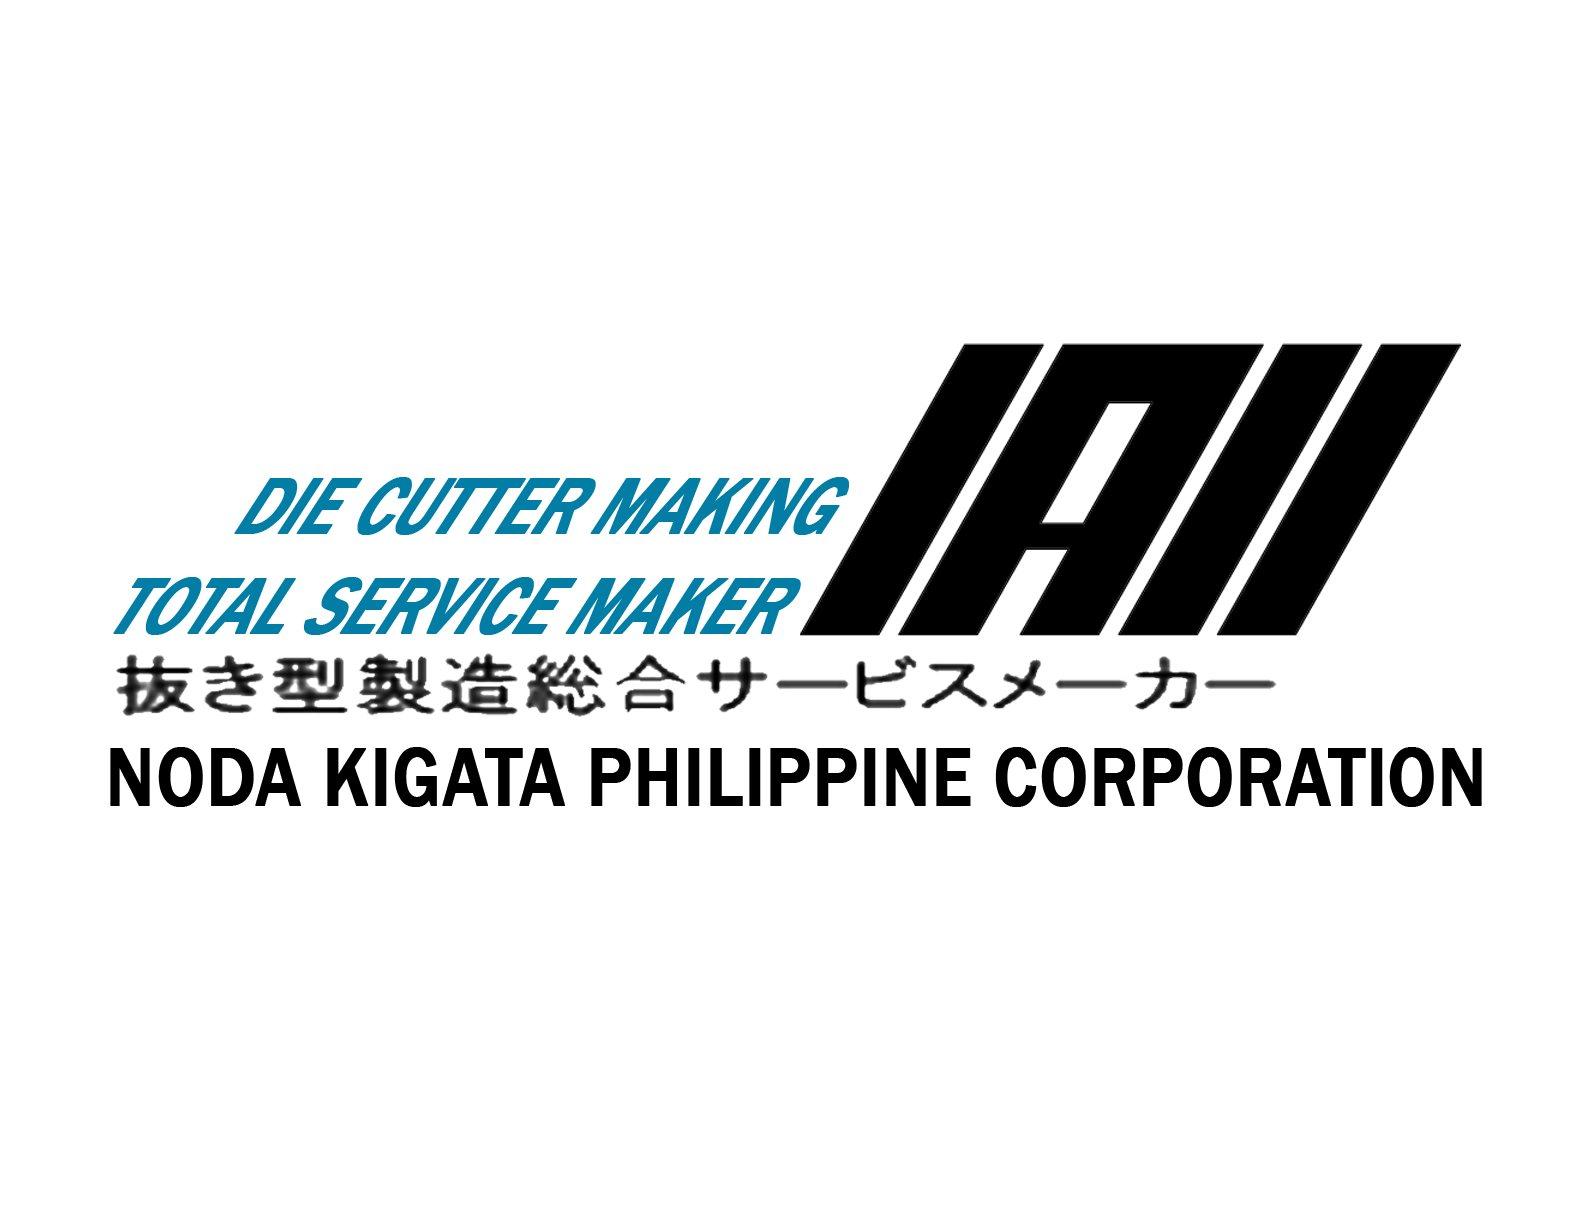 NODA KIGATA PHILIPPINE CORP.